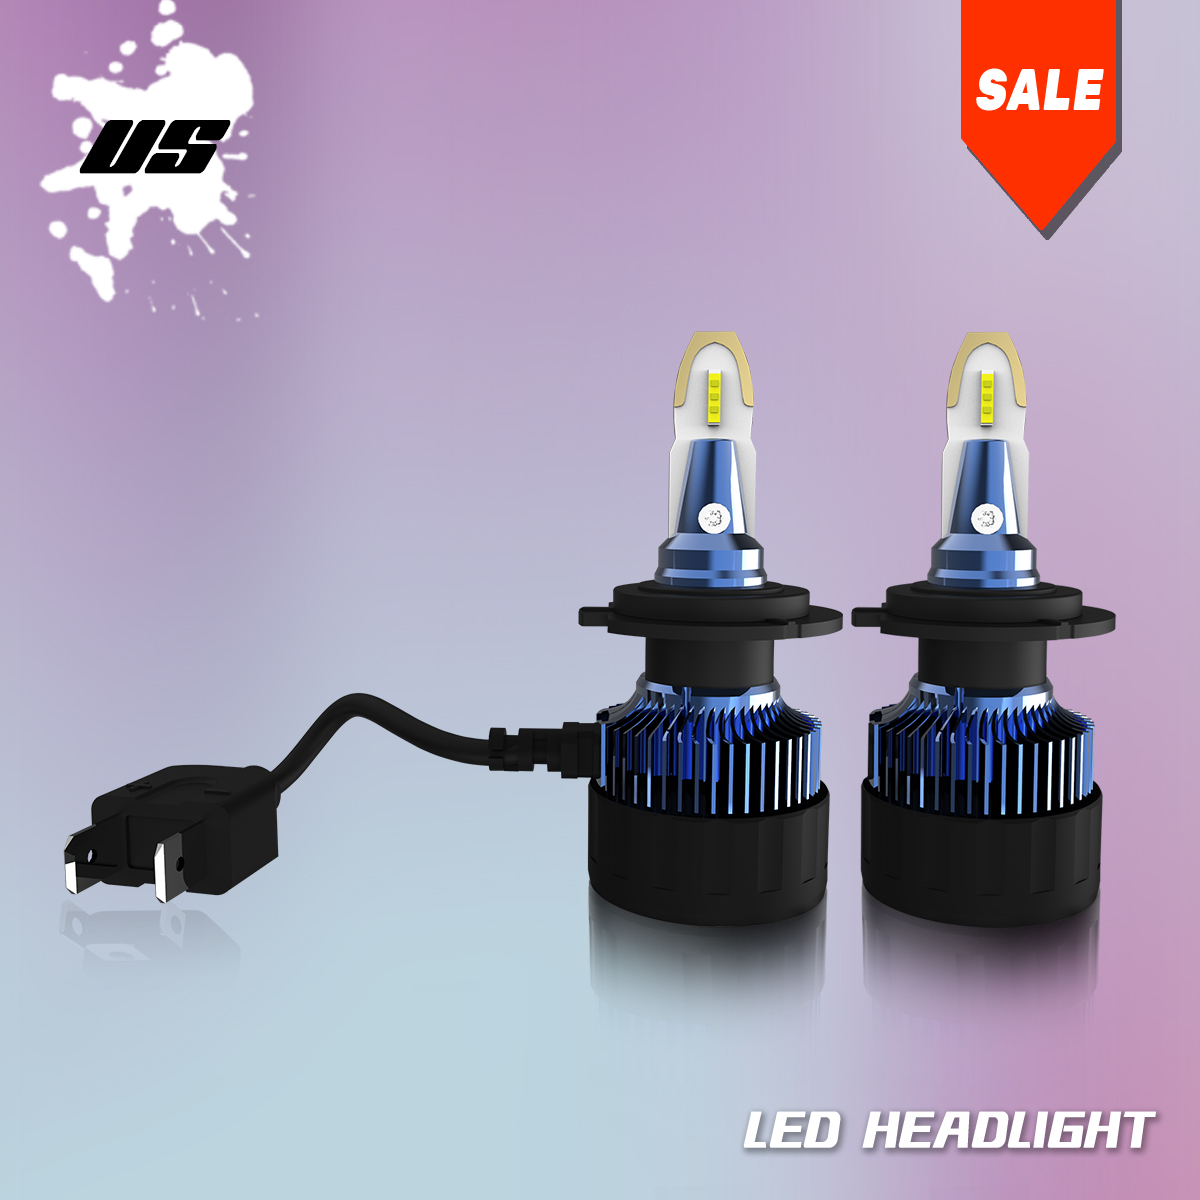 H7 Super Bright 5000LM LED Headlight Bulbs High/Low Beam